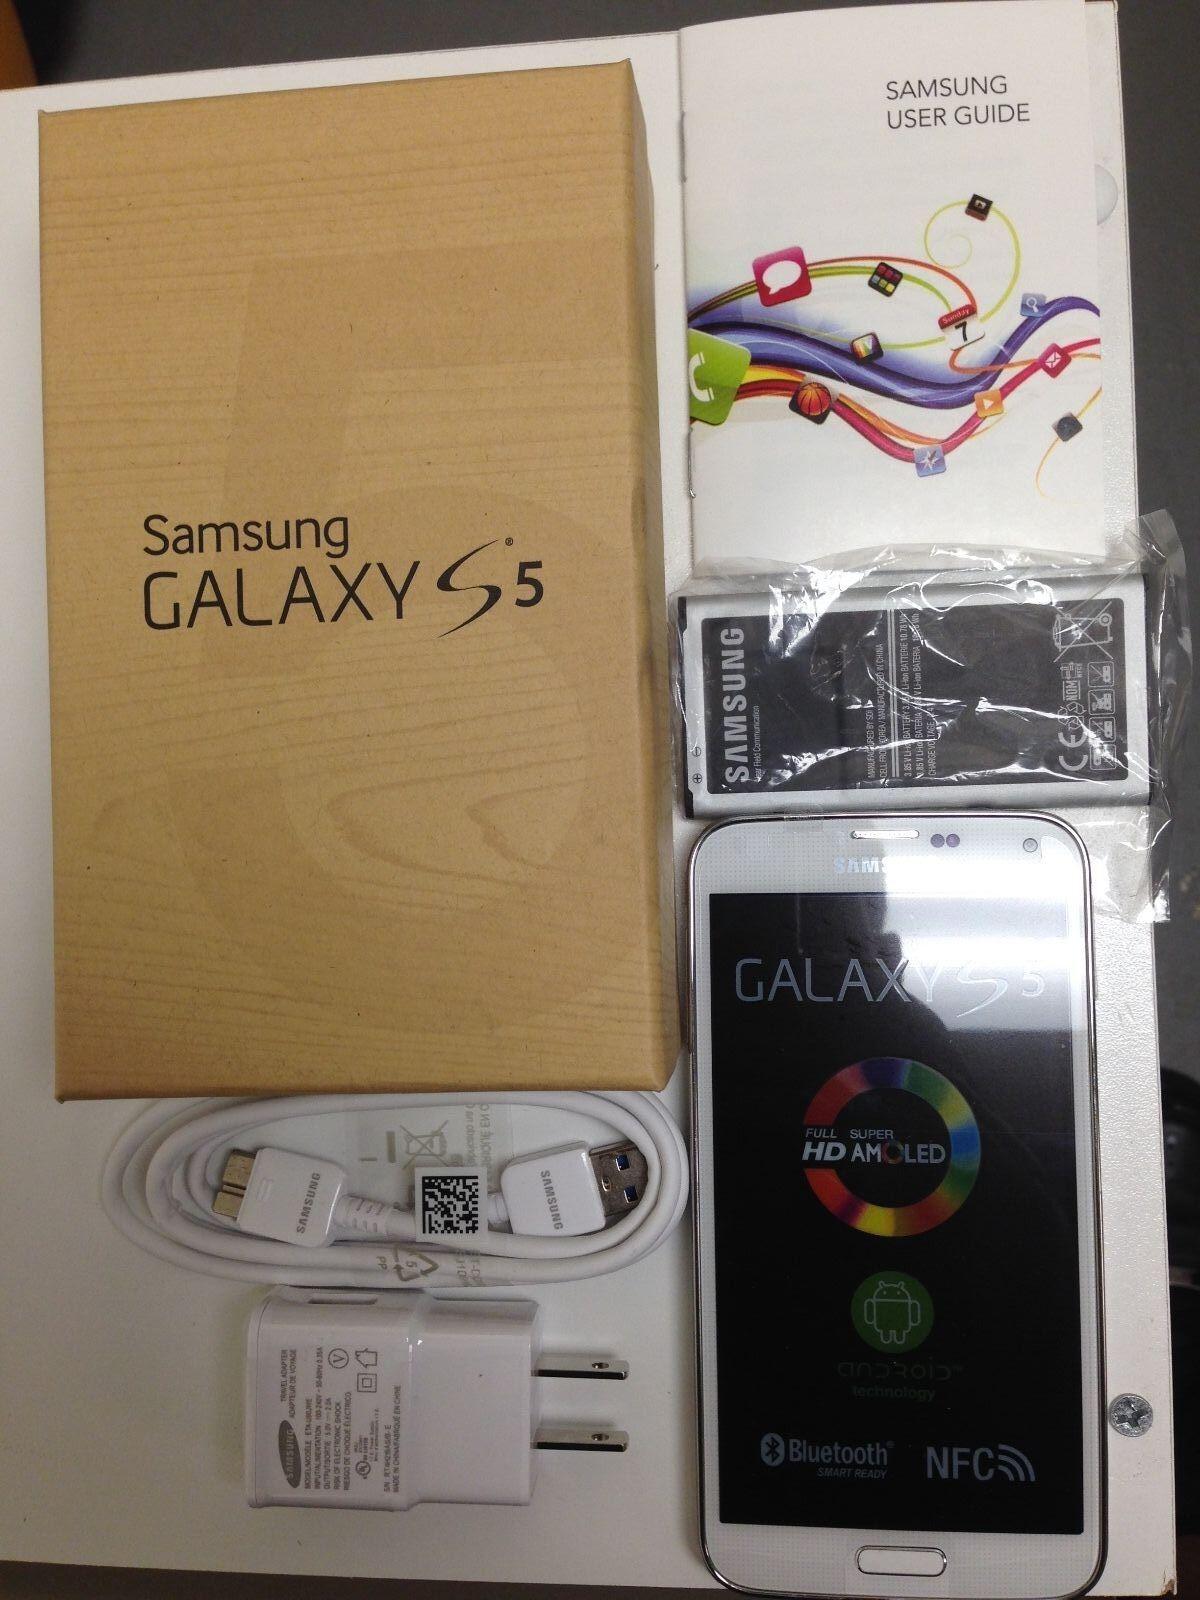 $155.99 - New In Box Samsung GALAXY S5 SM-G900V WHITE VERIZON Android PHONE